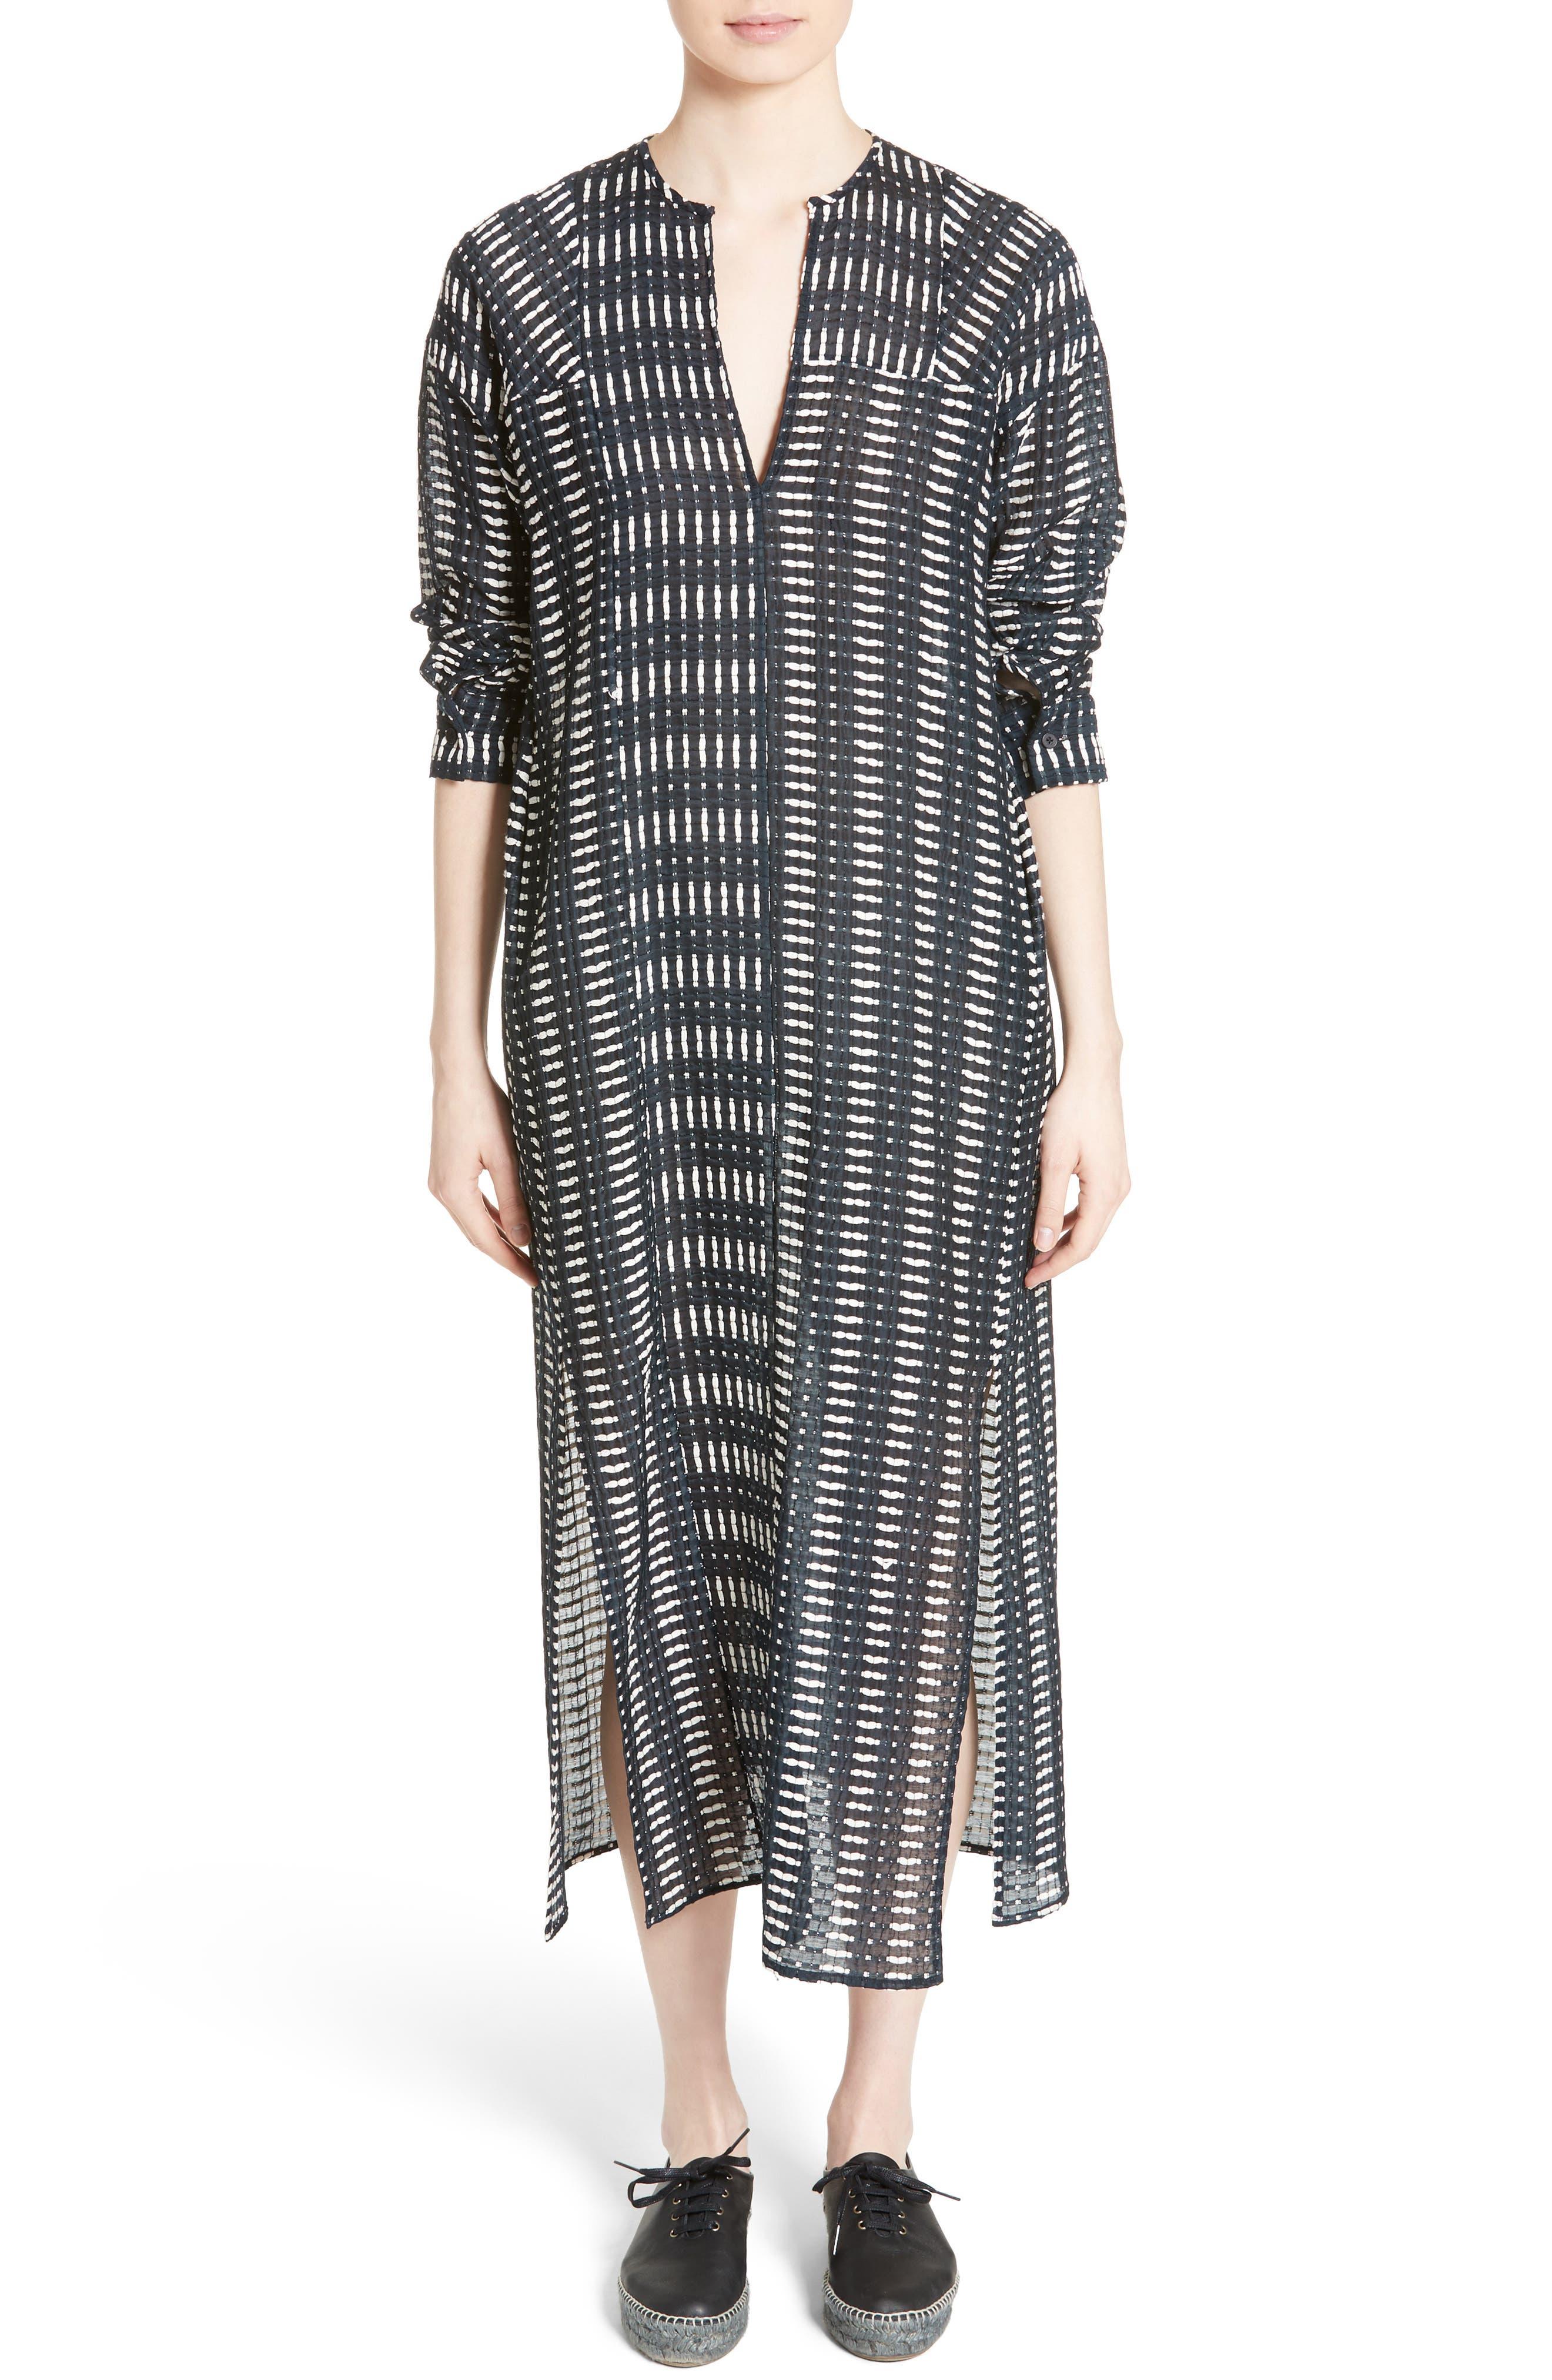 Alternate Image 1 Selected - Zero + Maria Cornejo Ire DNA Remix Dress